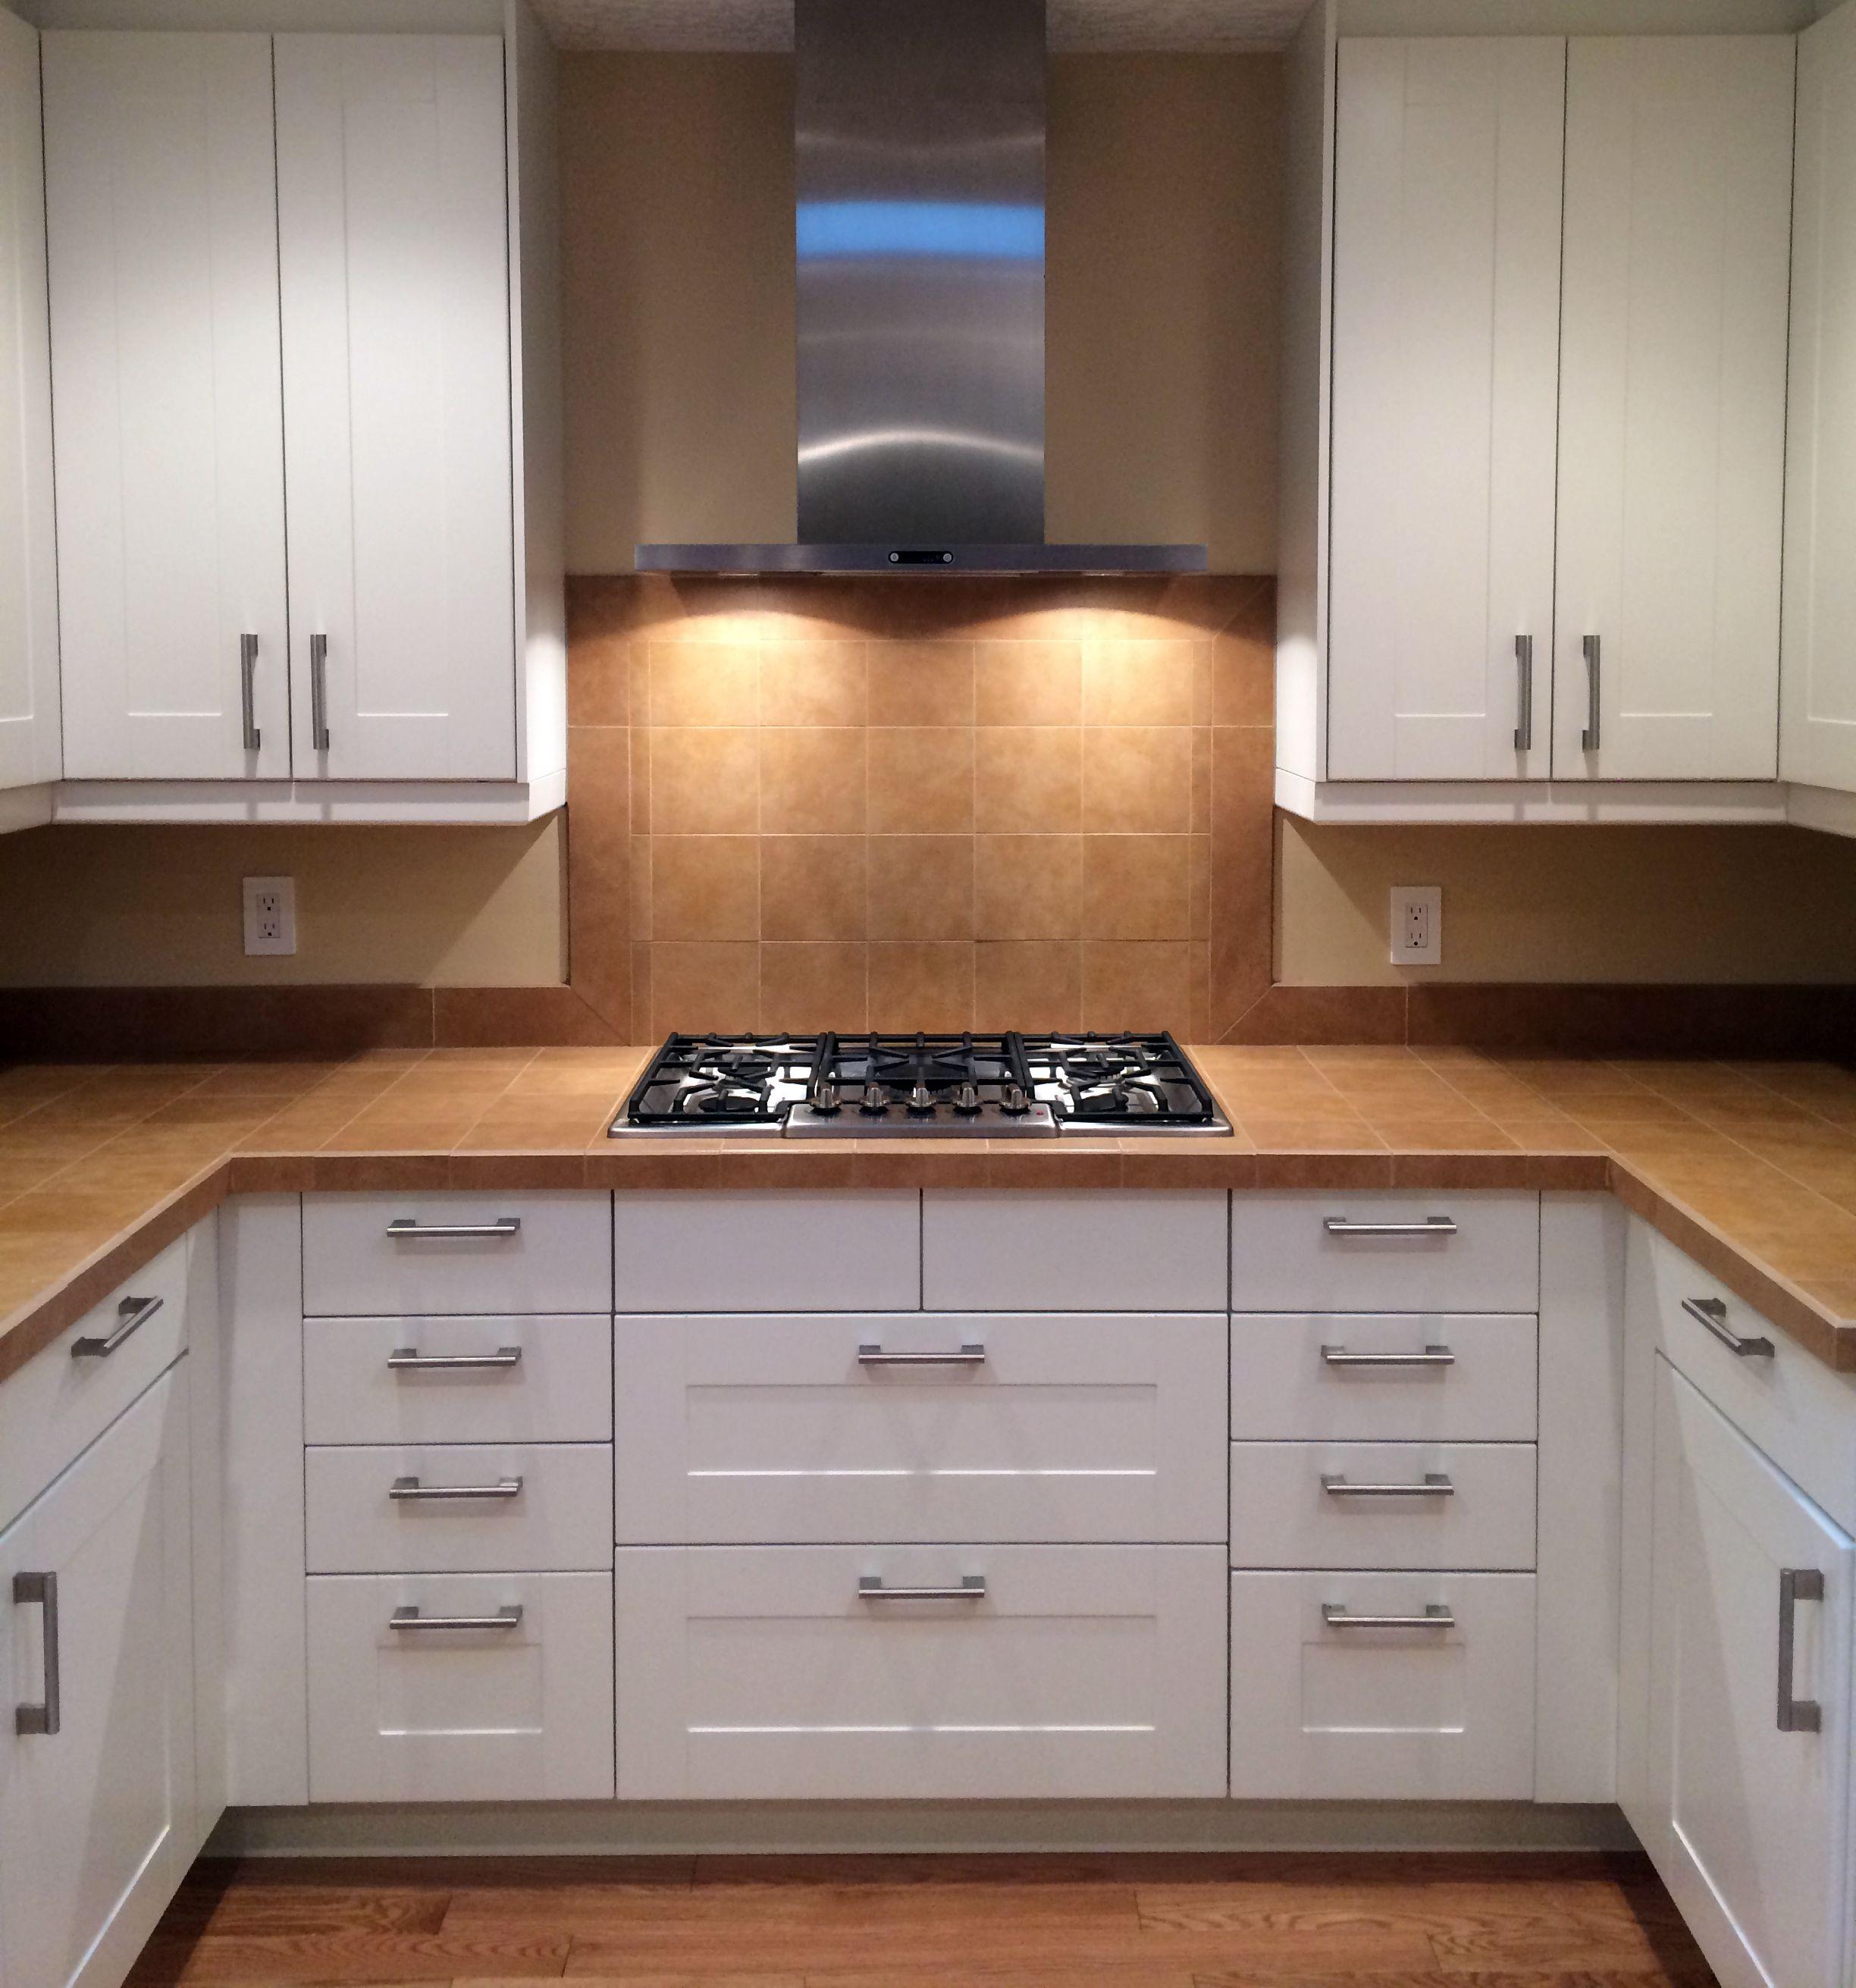 ikea grimslov kitchen Google Search Home kitchens